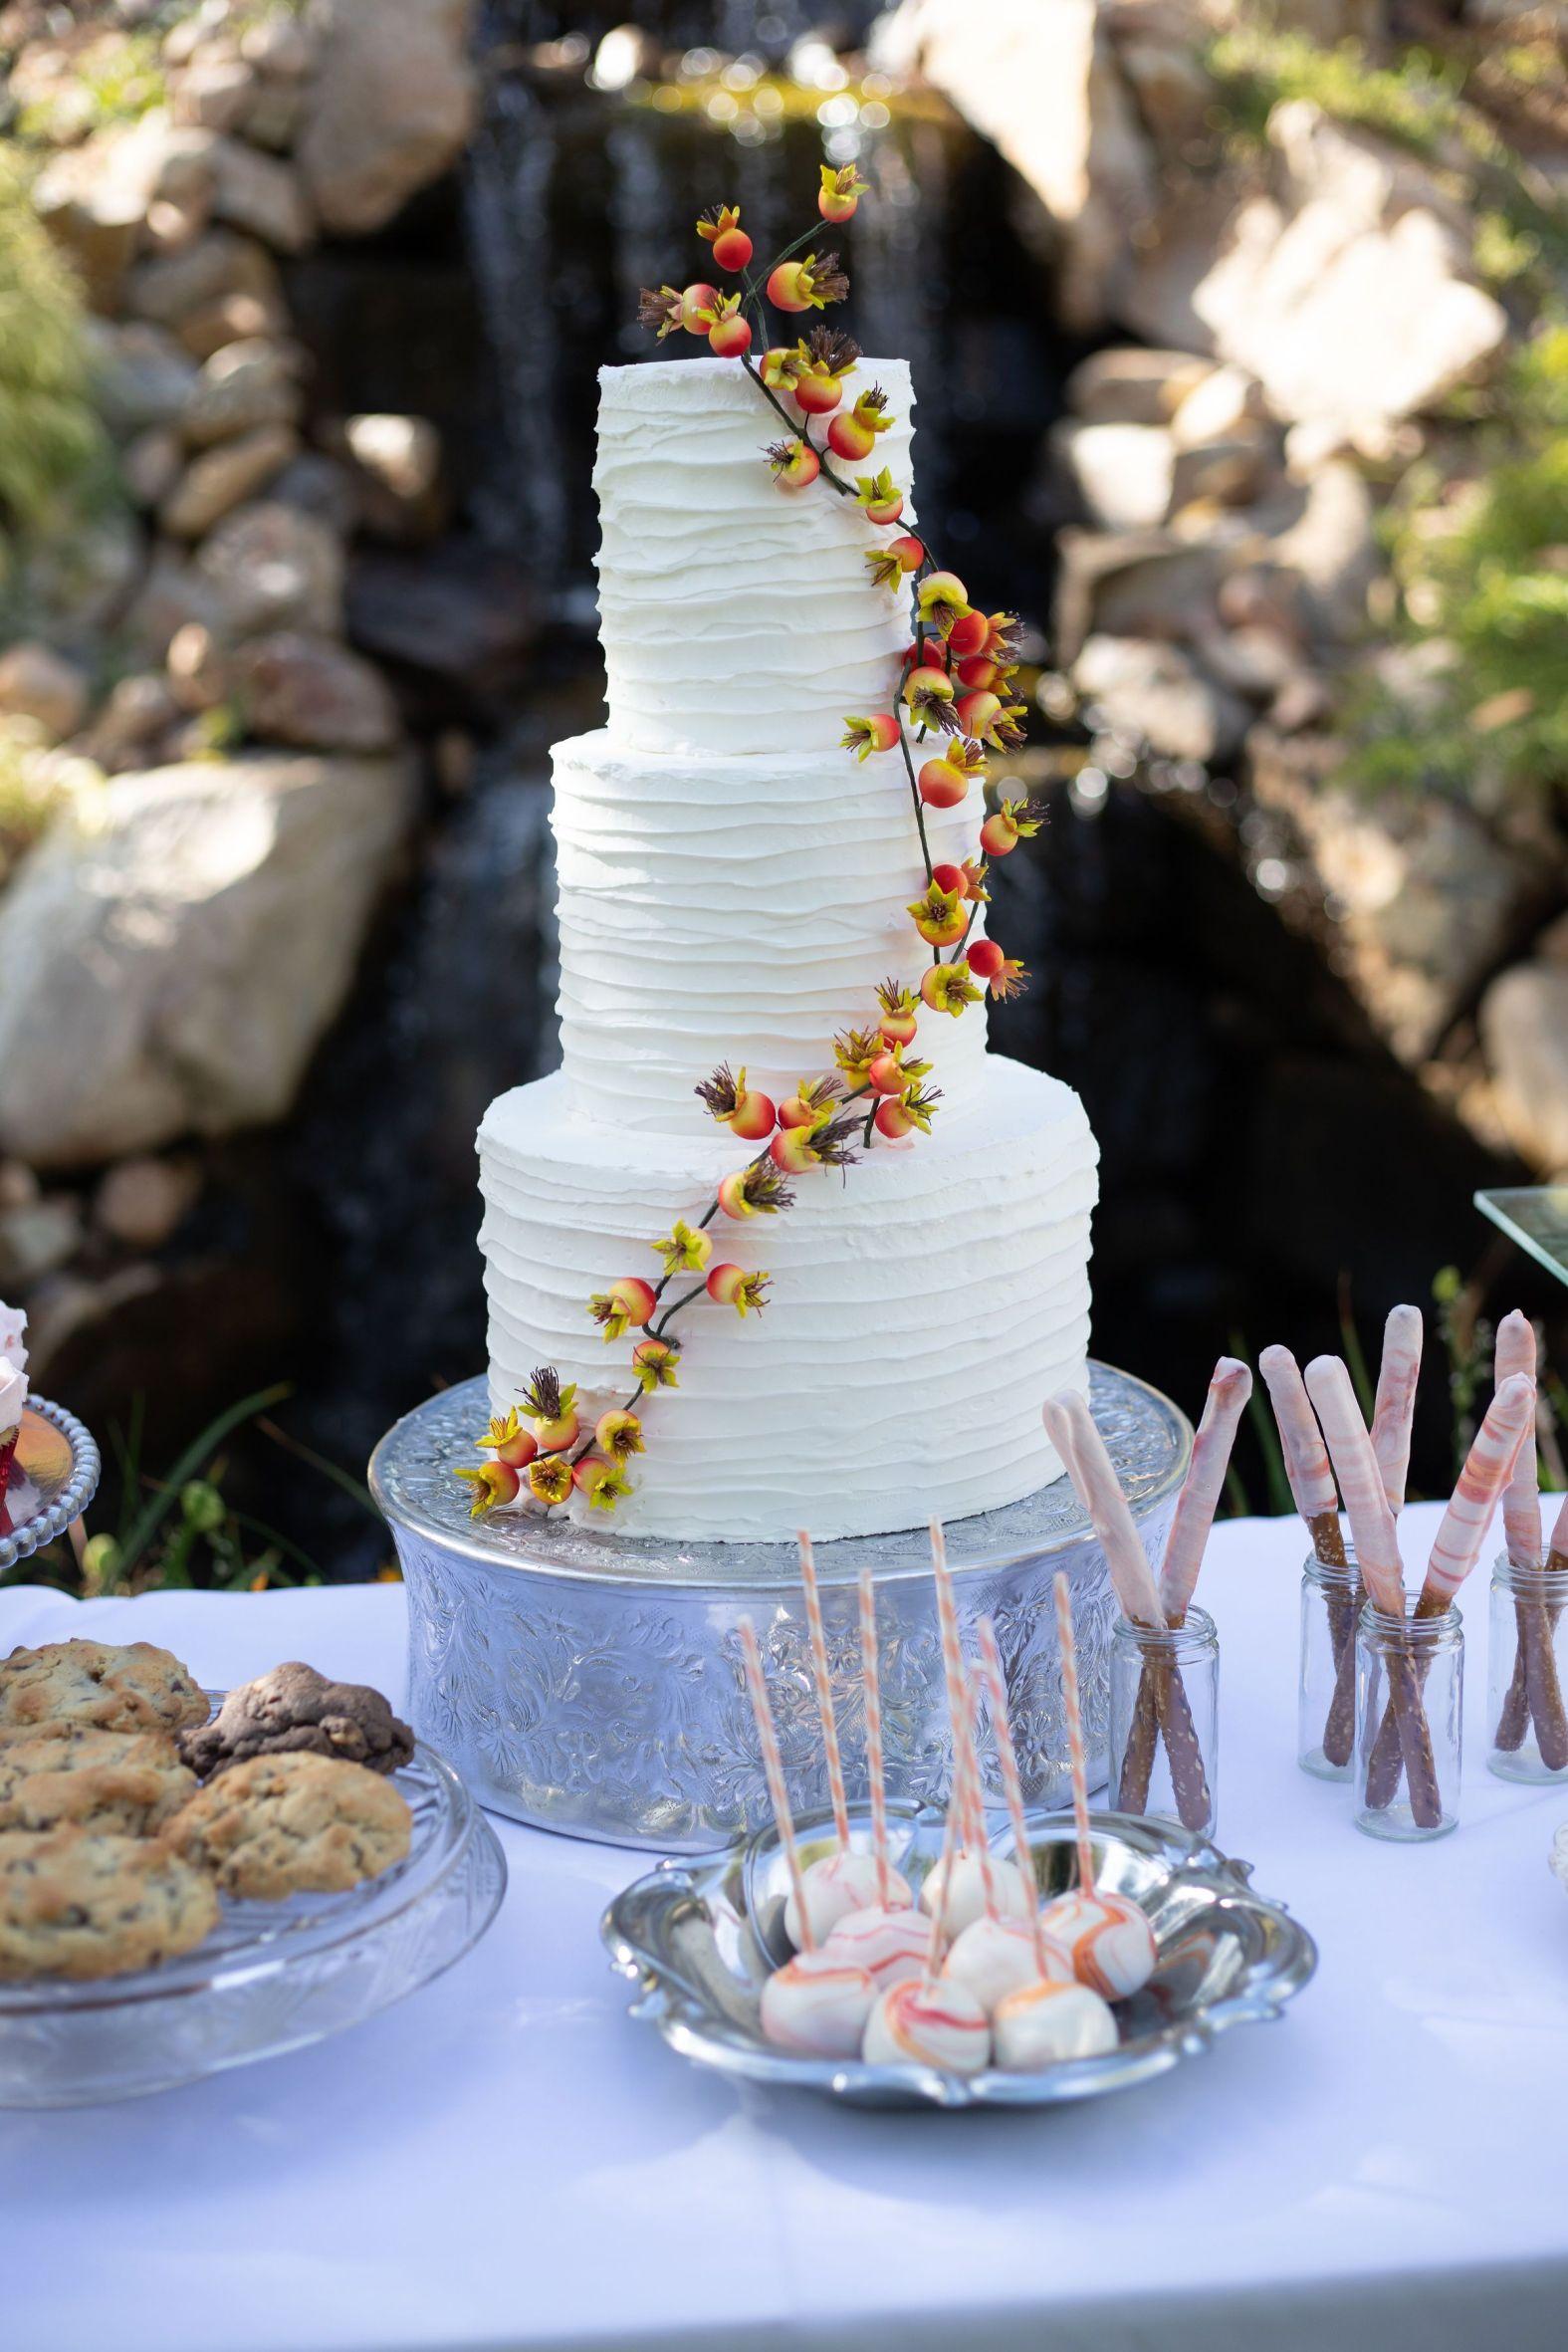 IMG_8473 Flower topped cake, Tulip cake, Drip cakes